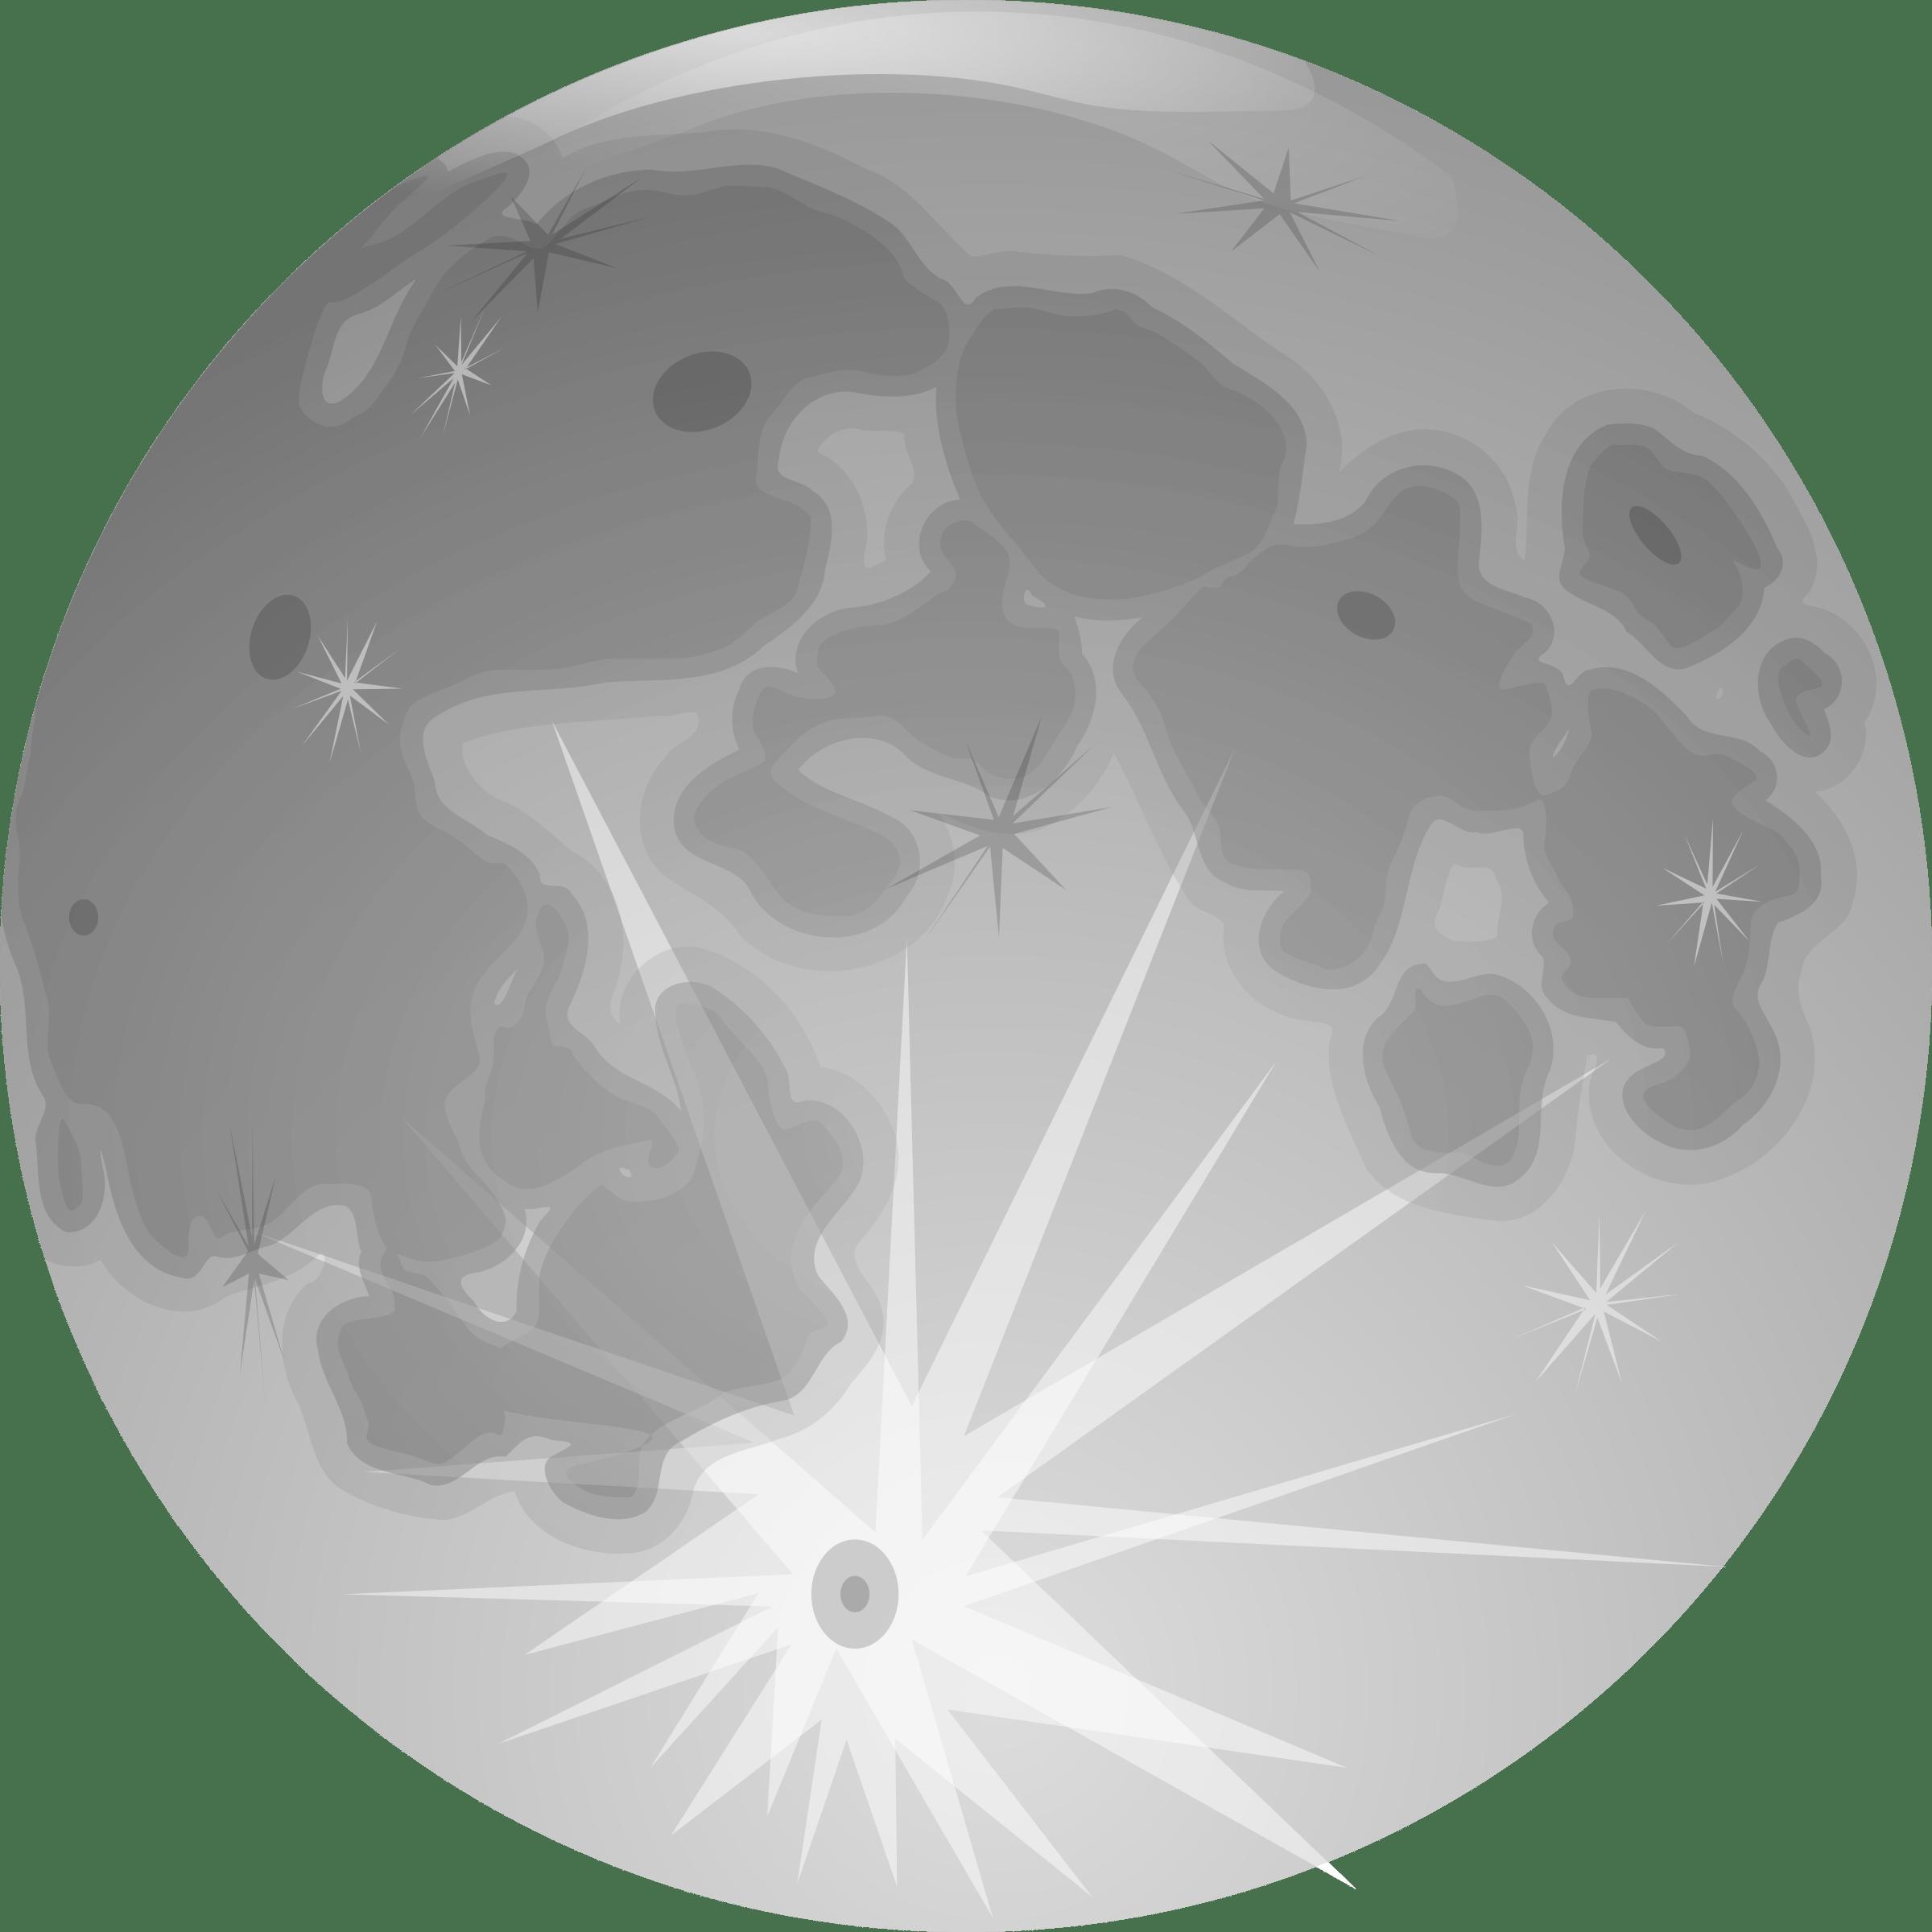 Moon Illustration Transparent PNG